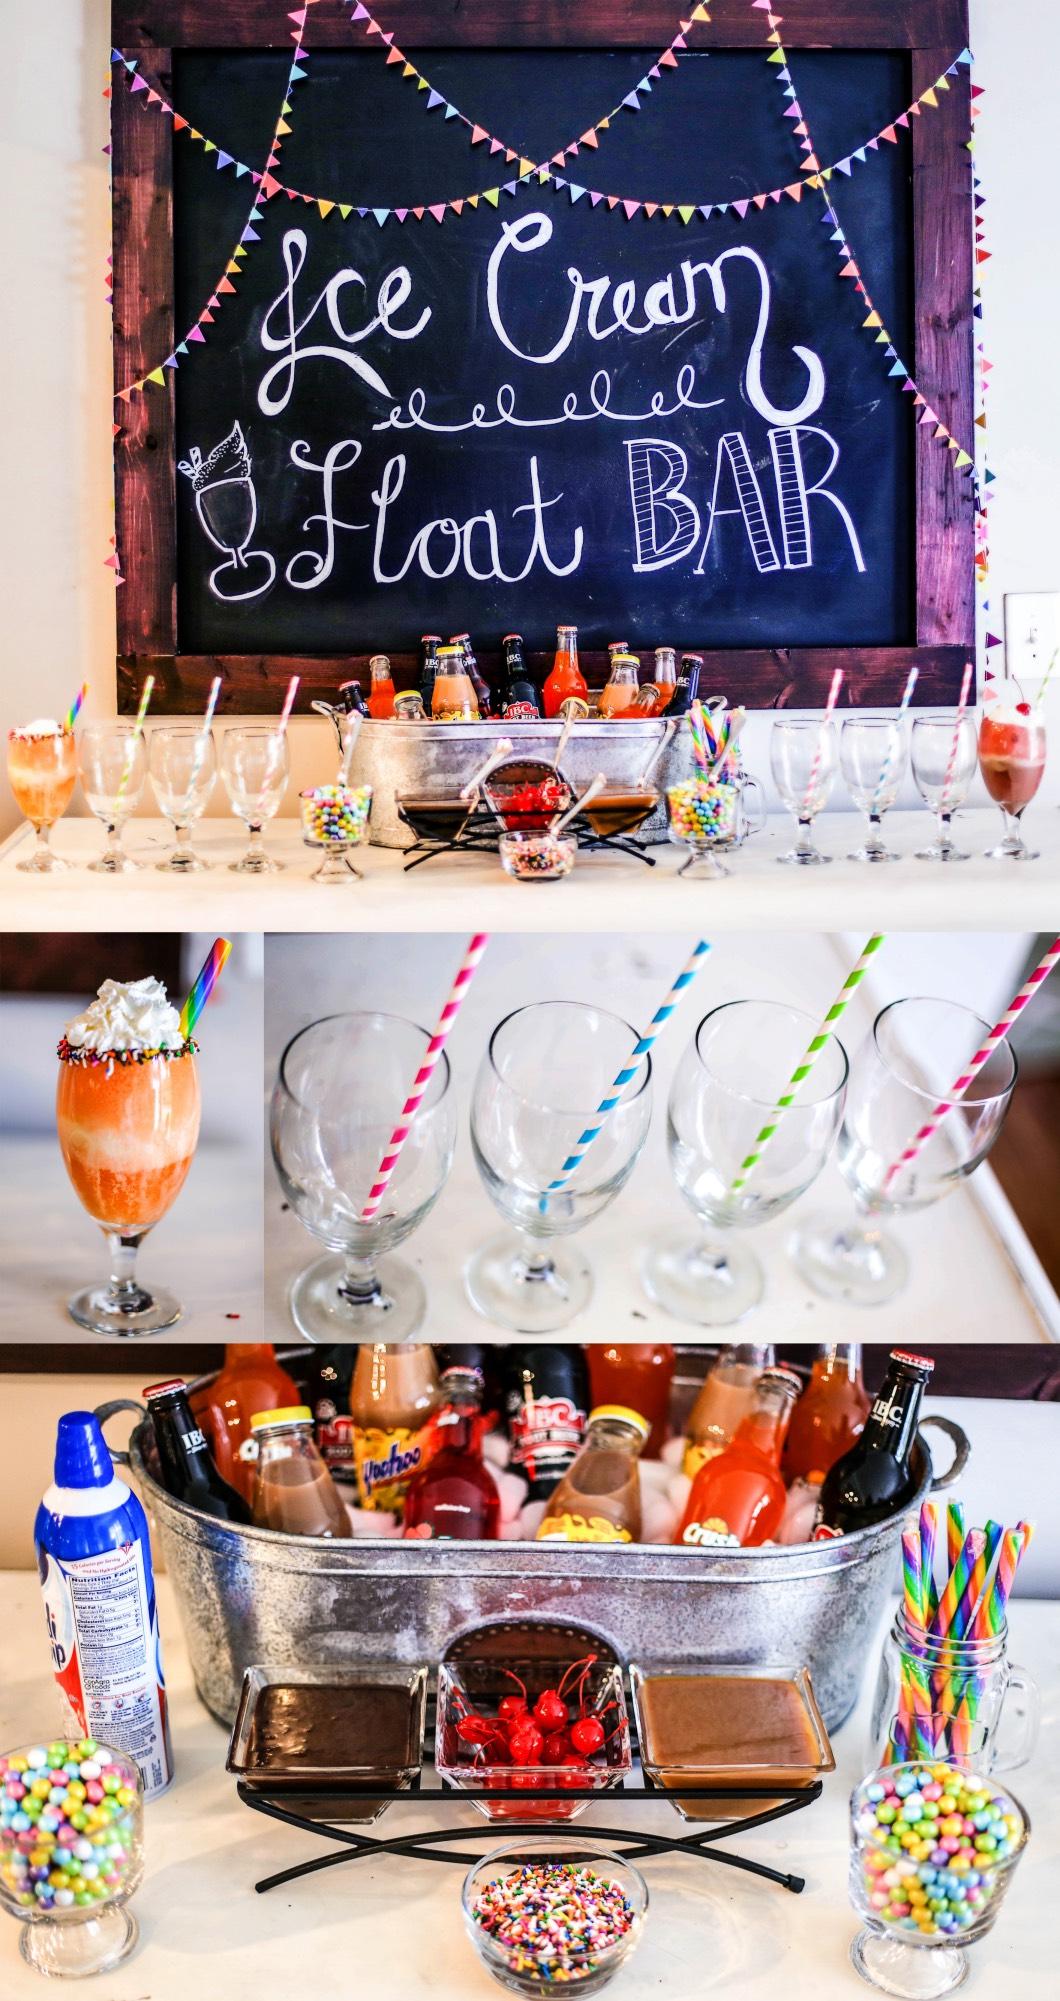 icecreamfloatbar